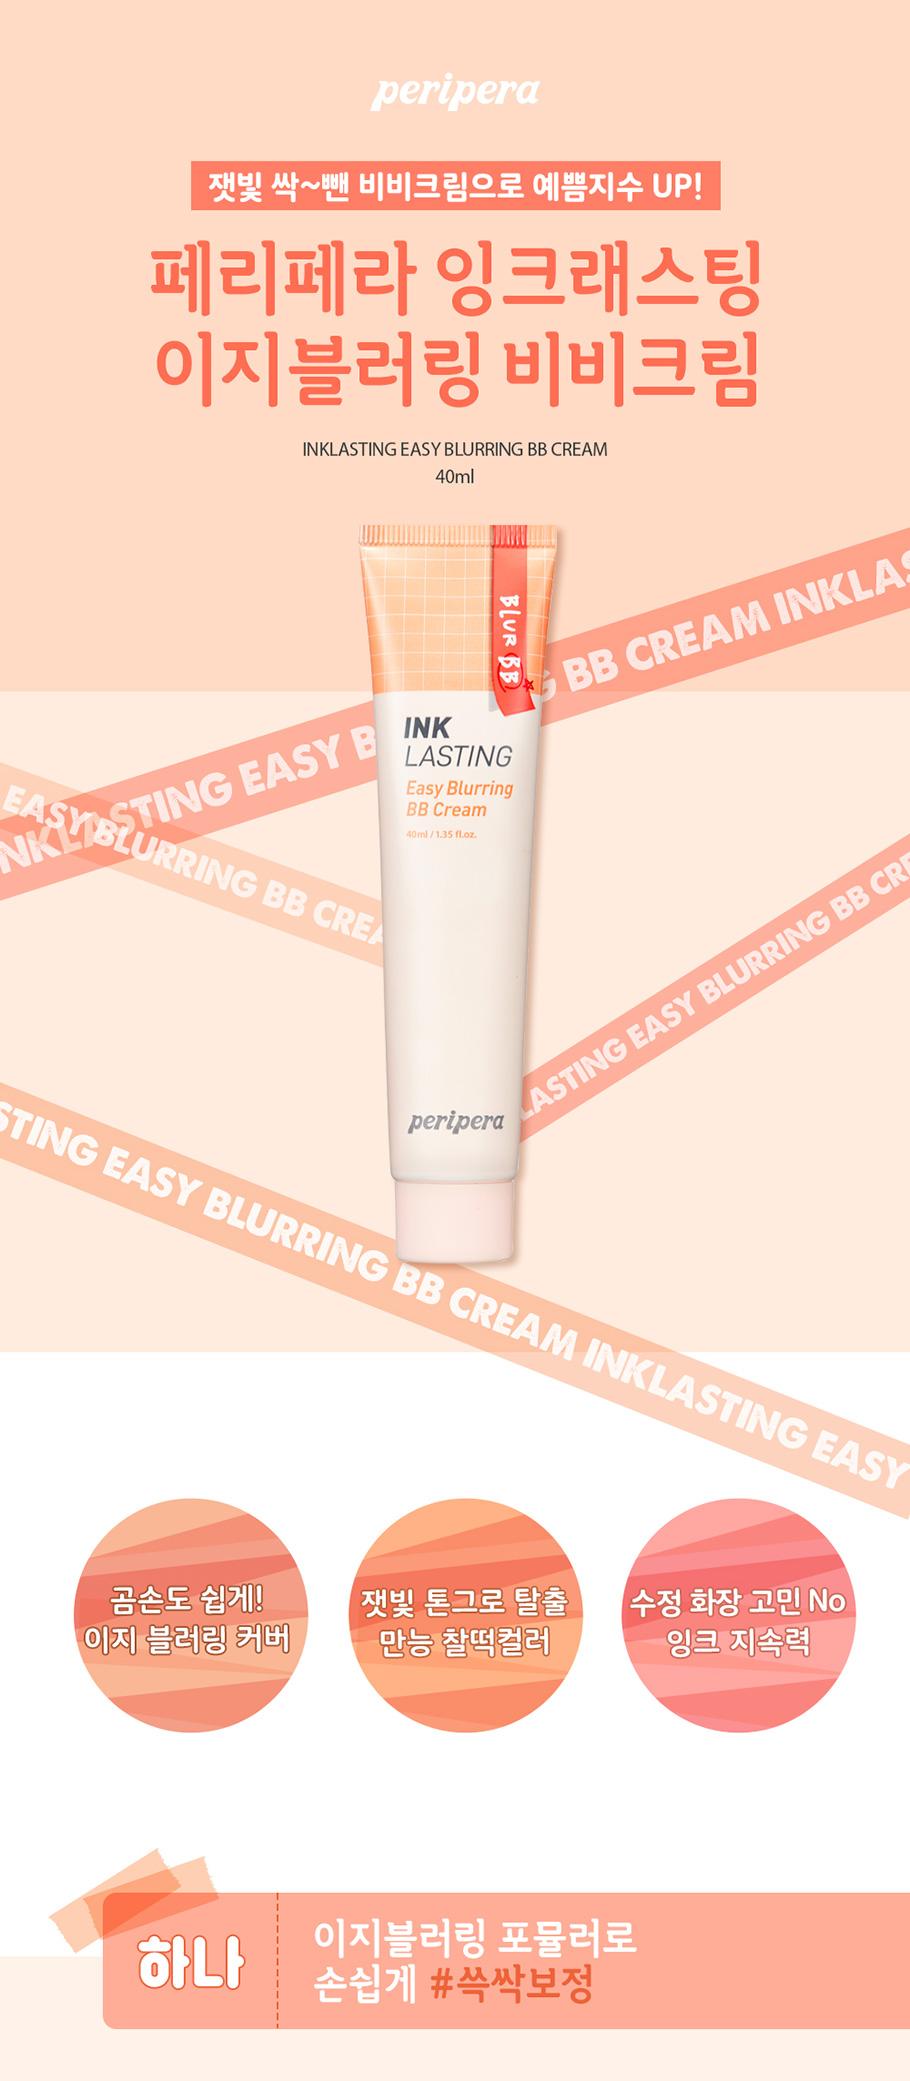 [ShiPAPA]Peripera | InkLasting Easy Blurring BB Cream| 韓國直送🇰🇷 | 香港 澳門